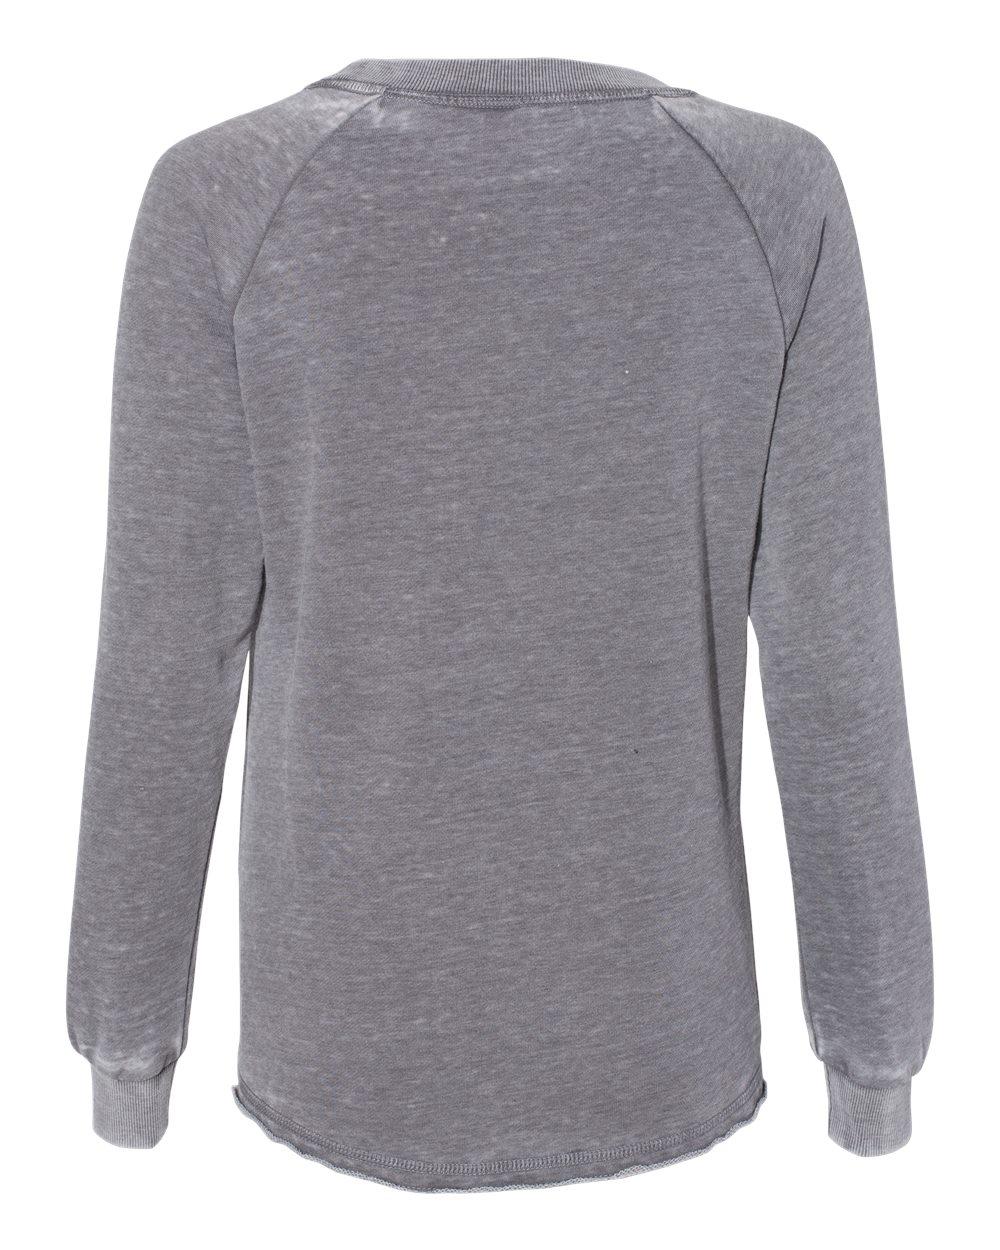 Alternative-Women-s-Lazy-Day-Burnout-French-Terry-LightSweatshirt-8626-up-to-XL thumbnail 10